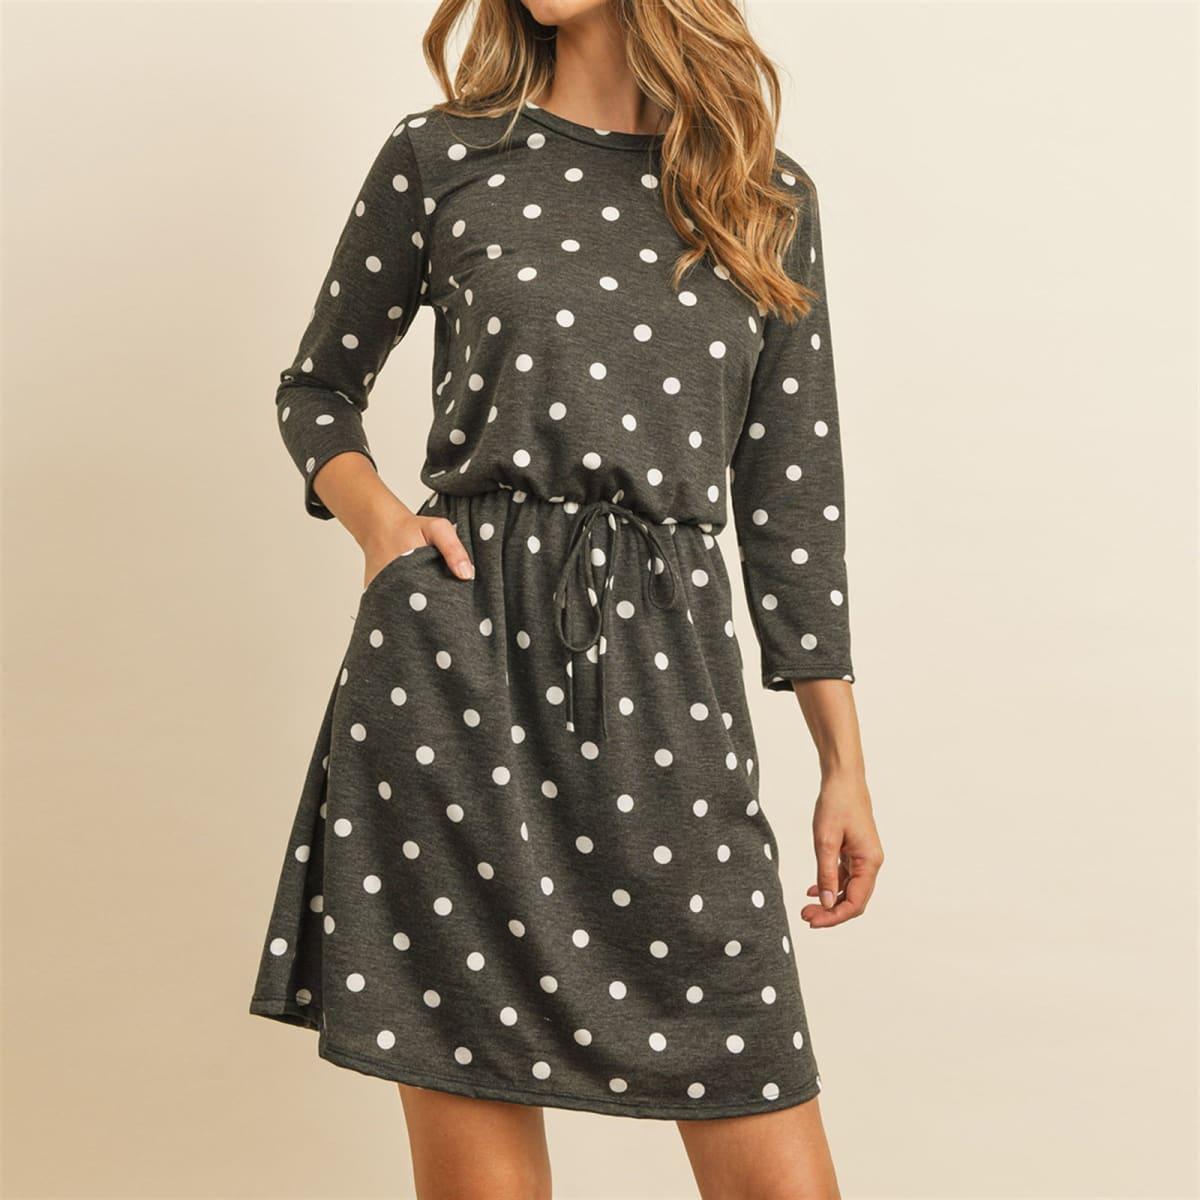 3/4 Sleeve Cinch Waist Pocket Dresses